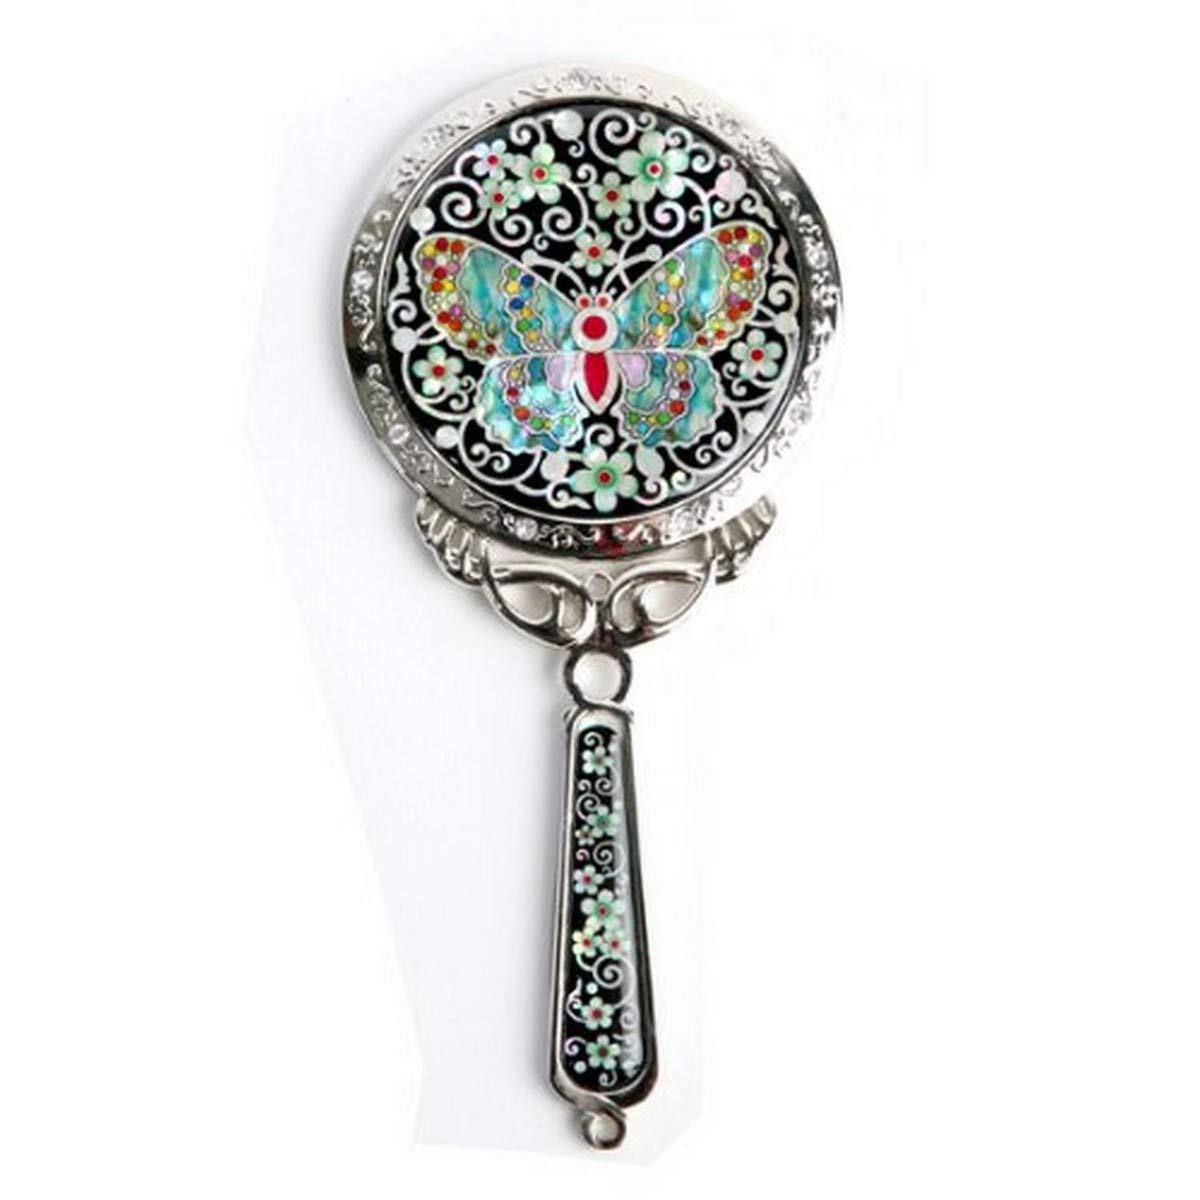 Antique Alive M121 Decorative Hand Mirror, 6.7 Ounce